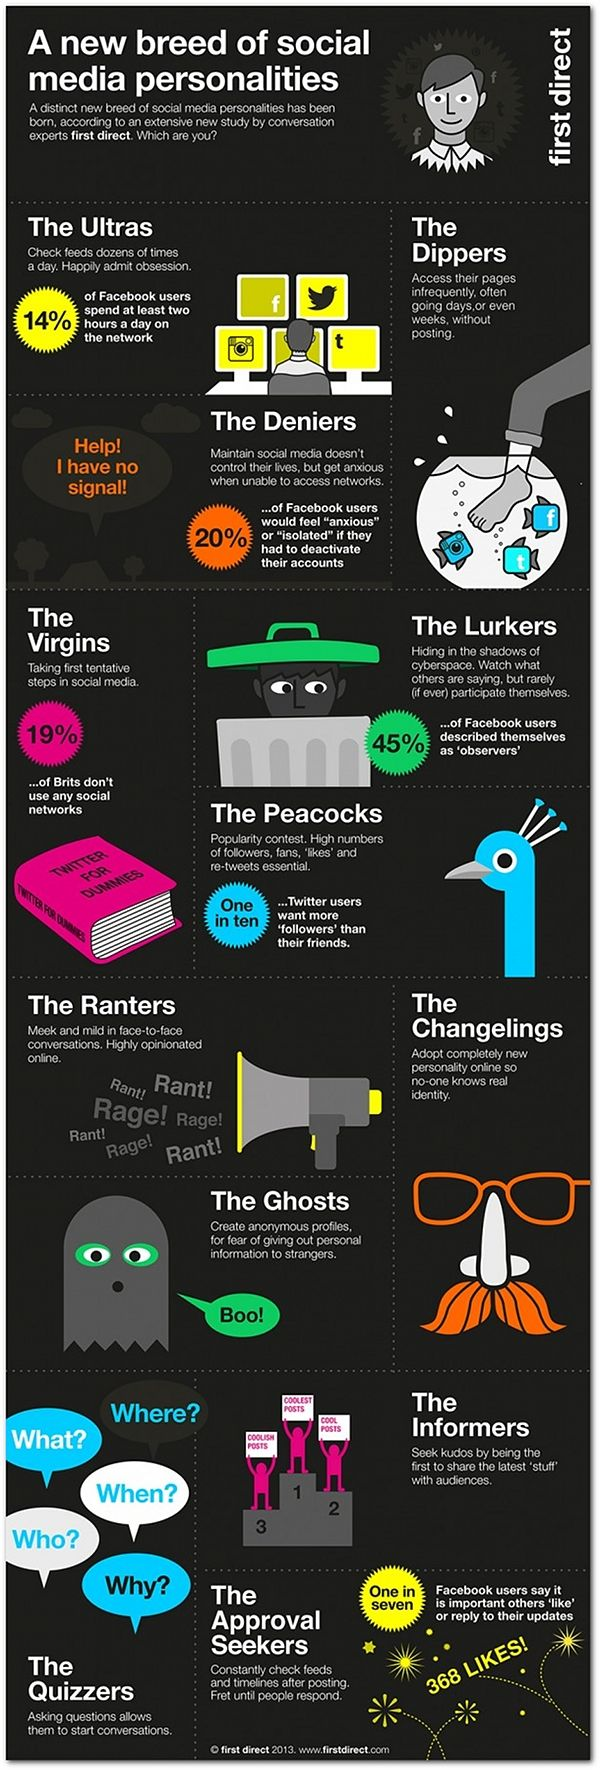 12 types of social media personalities